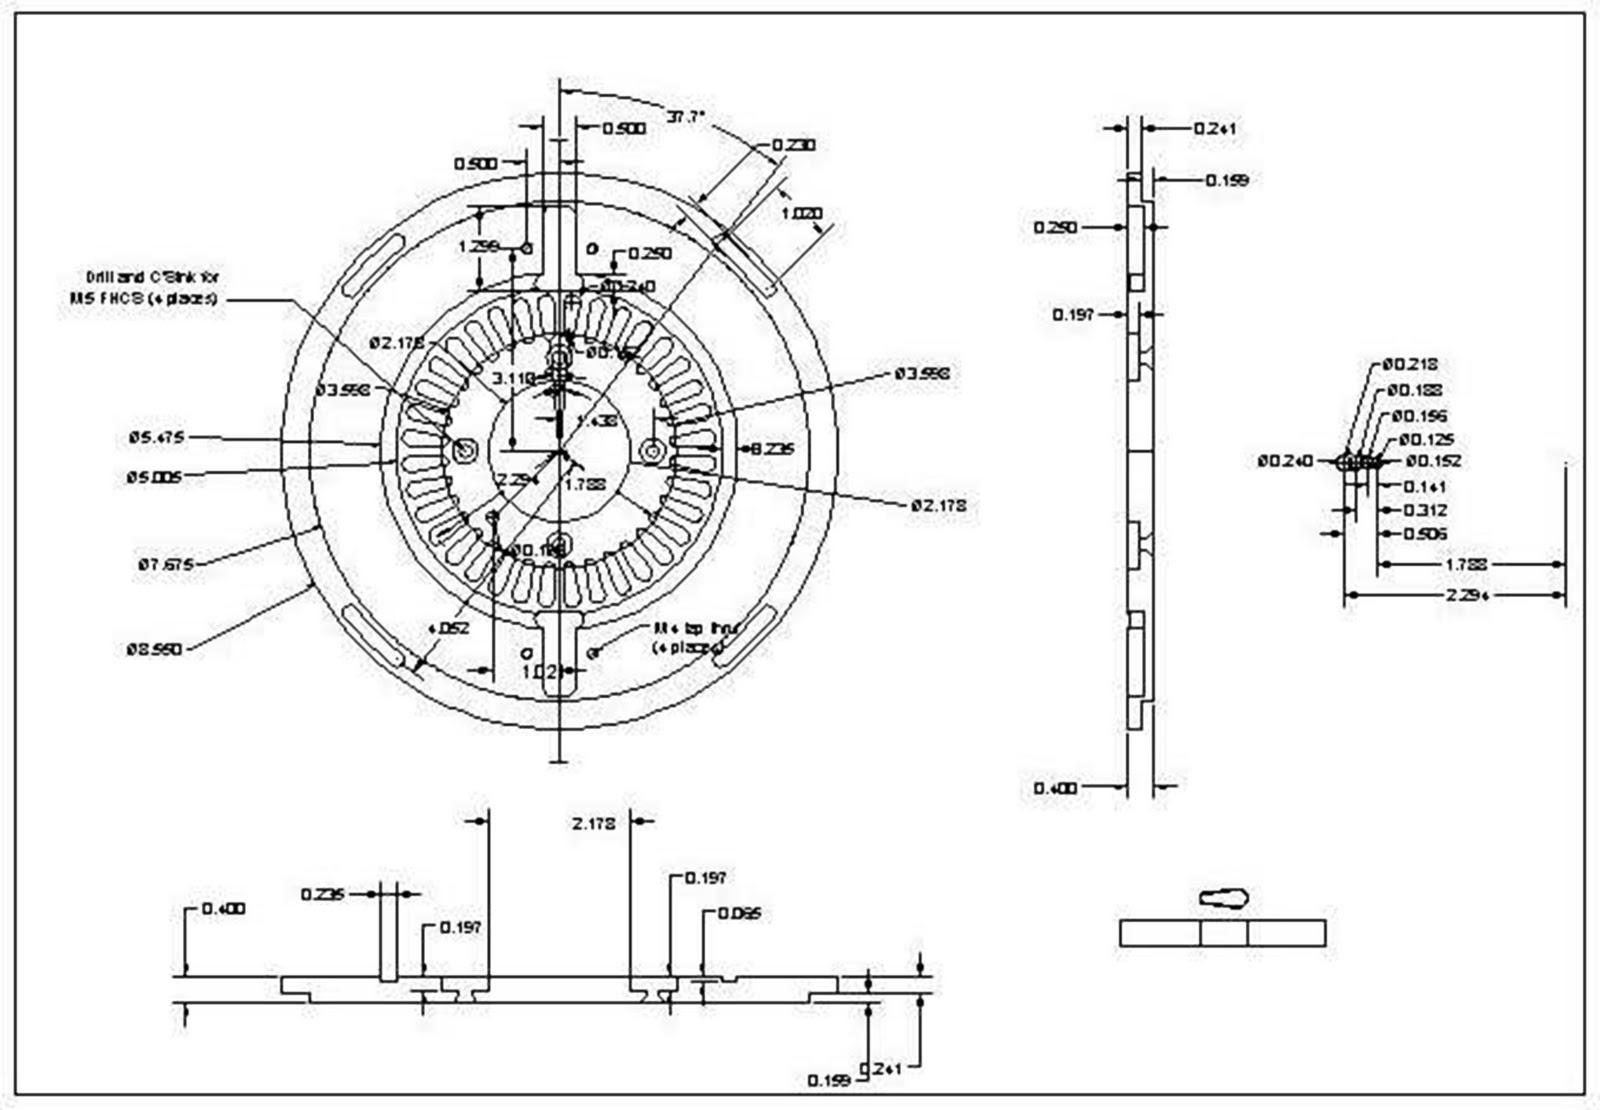 The Design Wizard Engineering